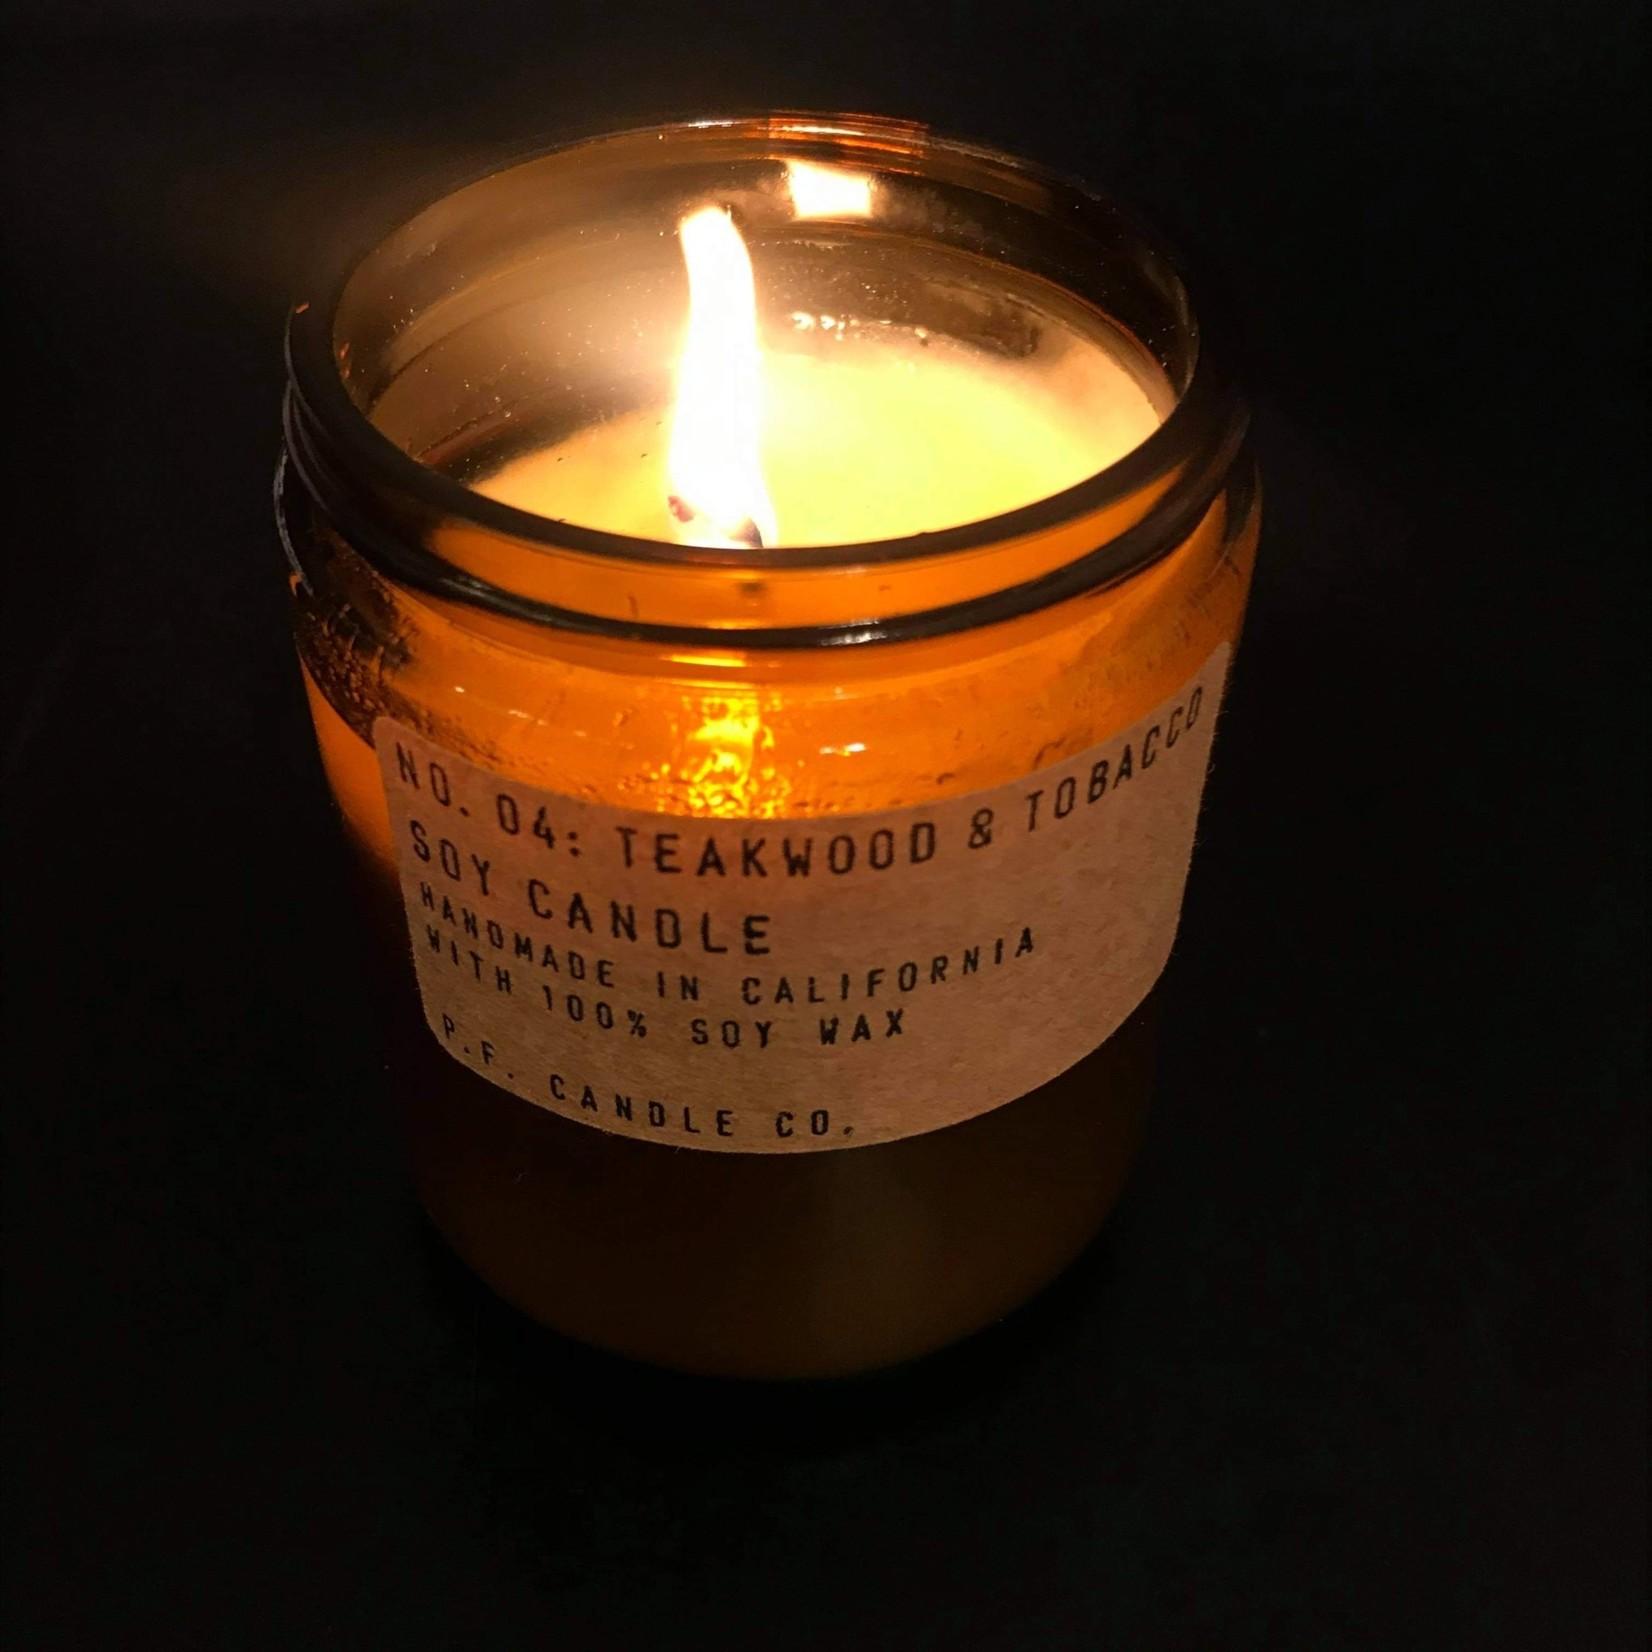 P.F. Candle P.F. Candle Co. Teakwood & Tobacco 7.2oz Candle